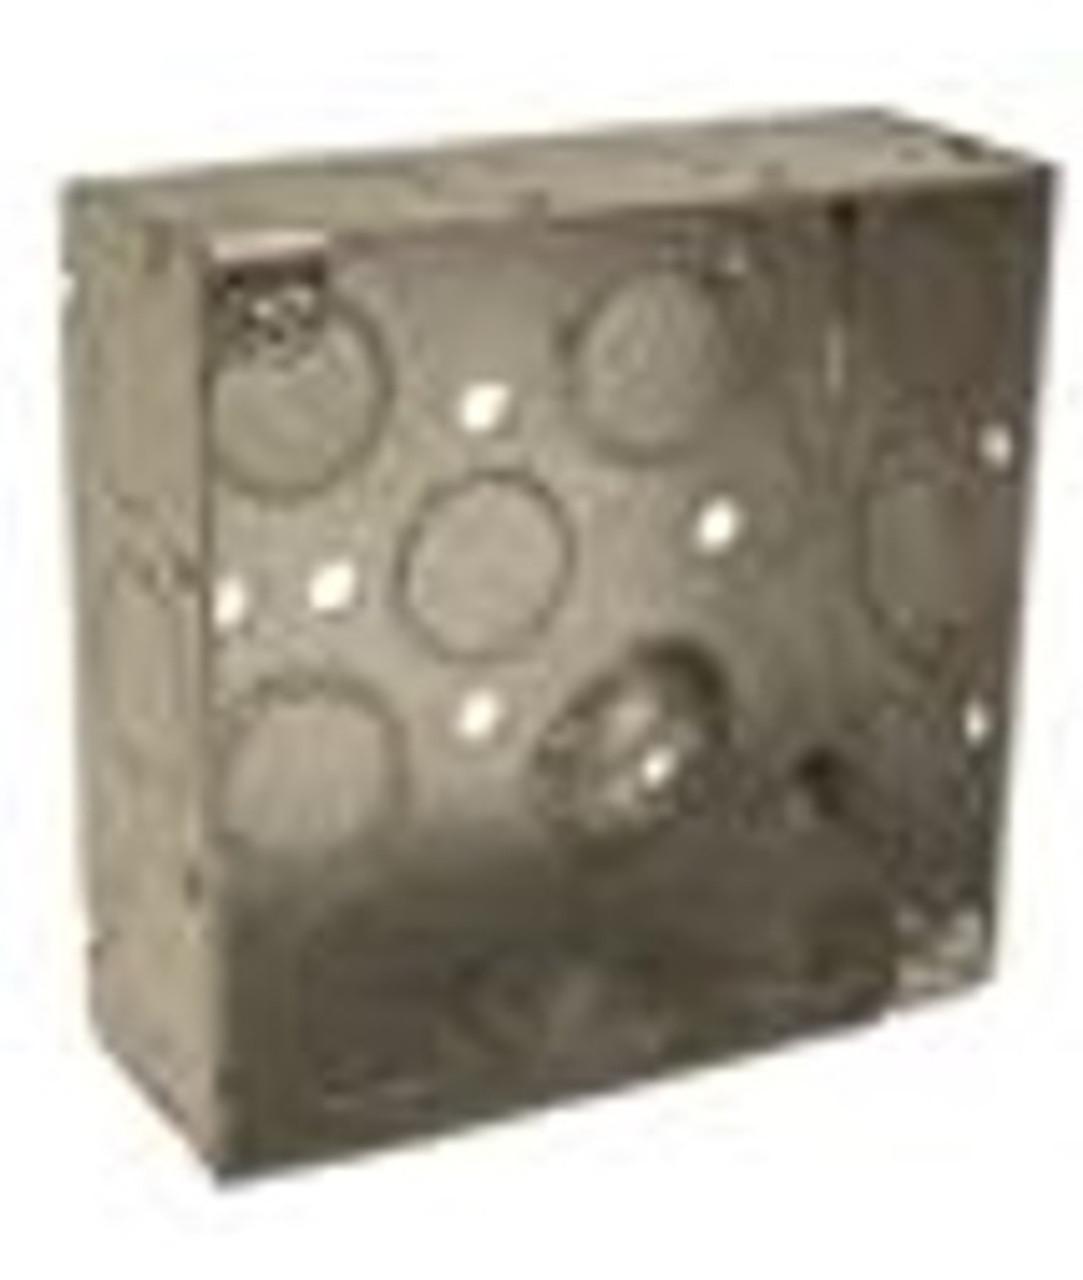 "SQUARE BOX 4"" x 2 1/8"" DEEP"